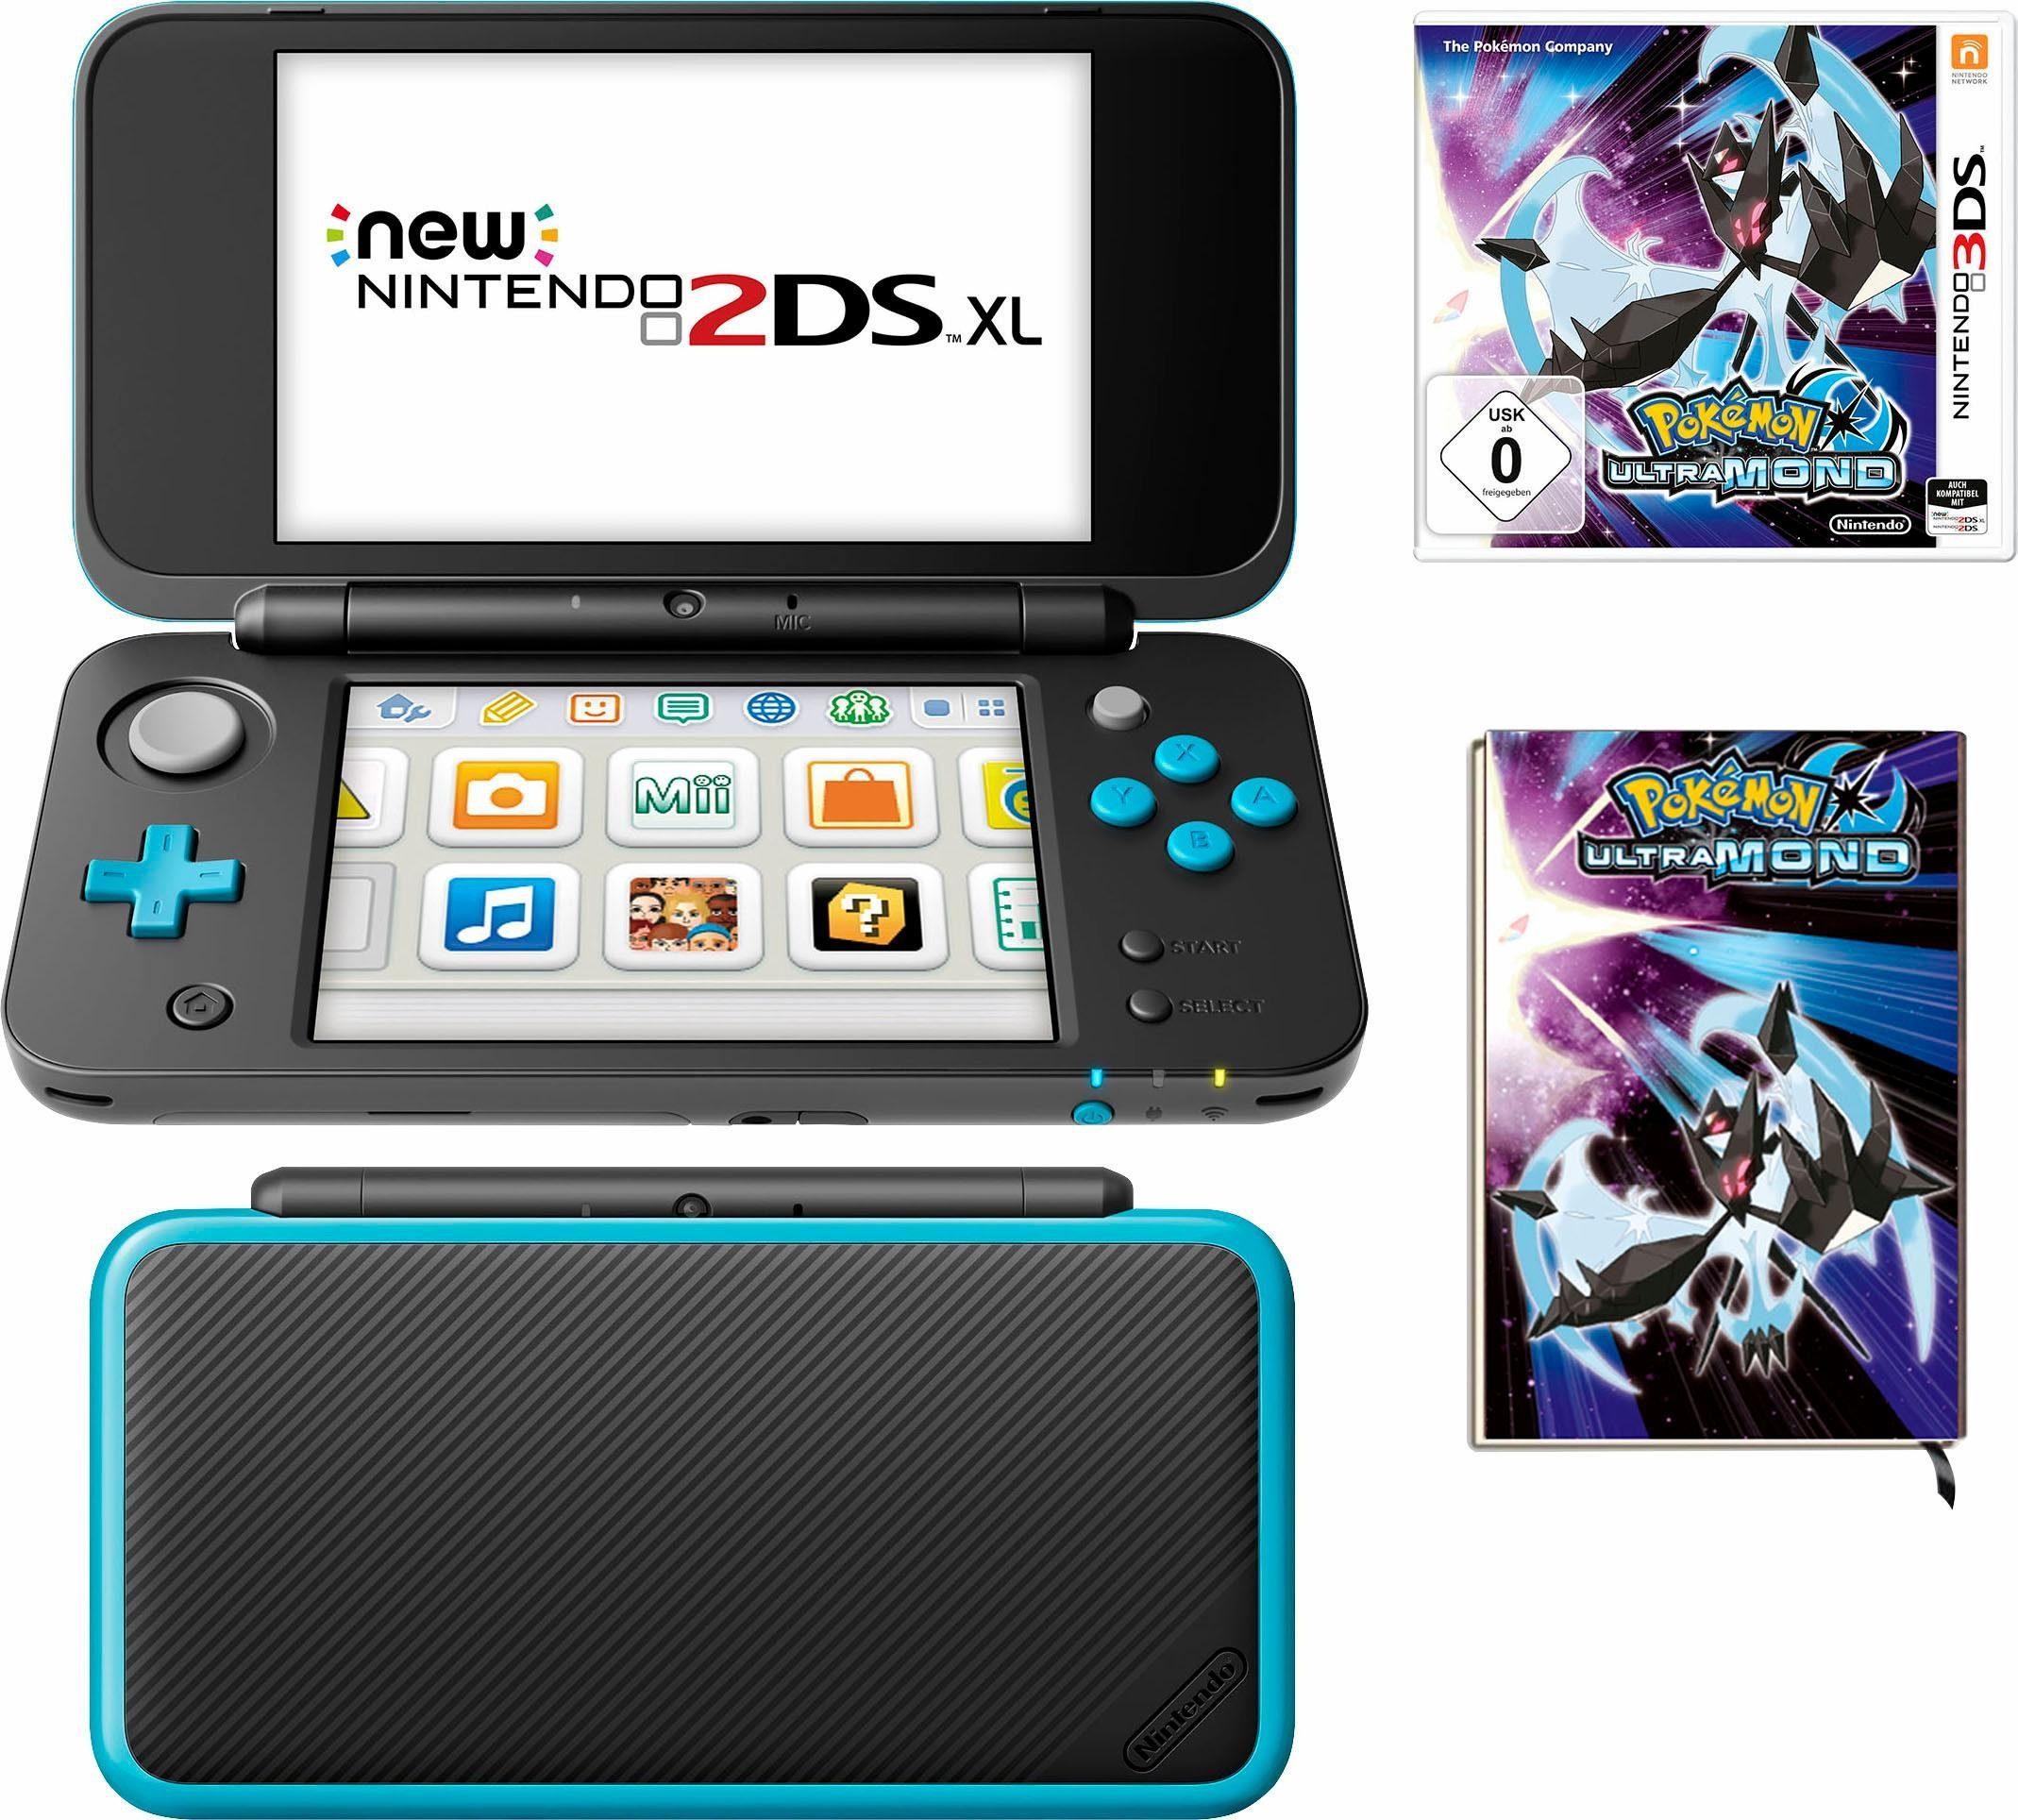 New Nintendo 2DS XL + Pokemon Ultramond + Notizbuch